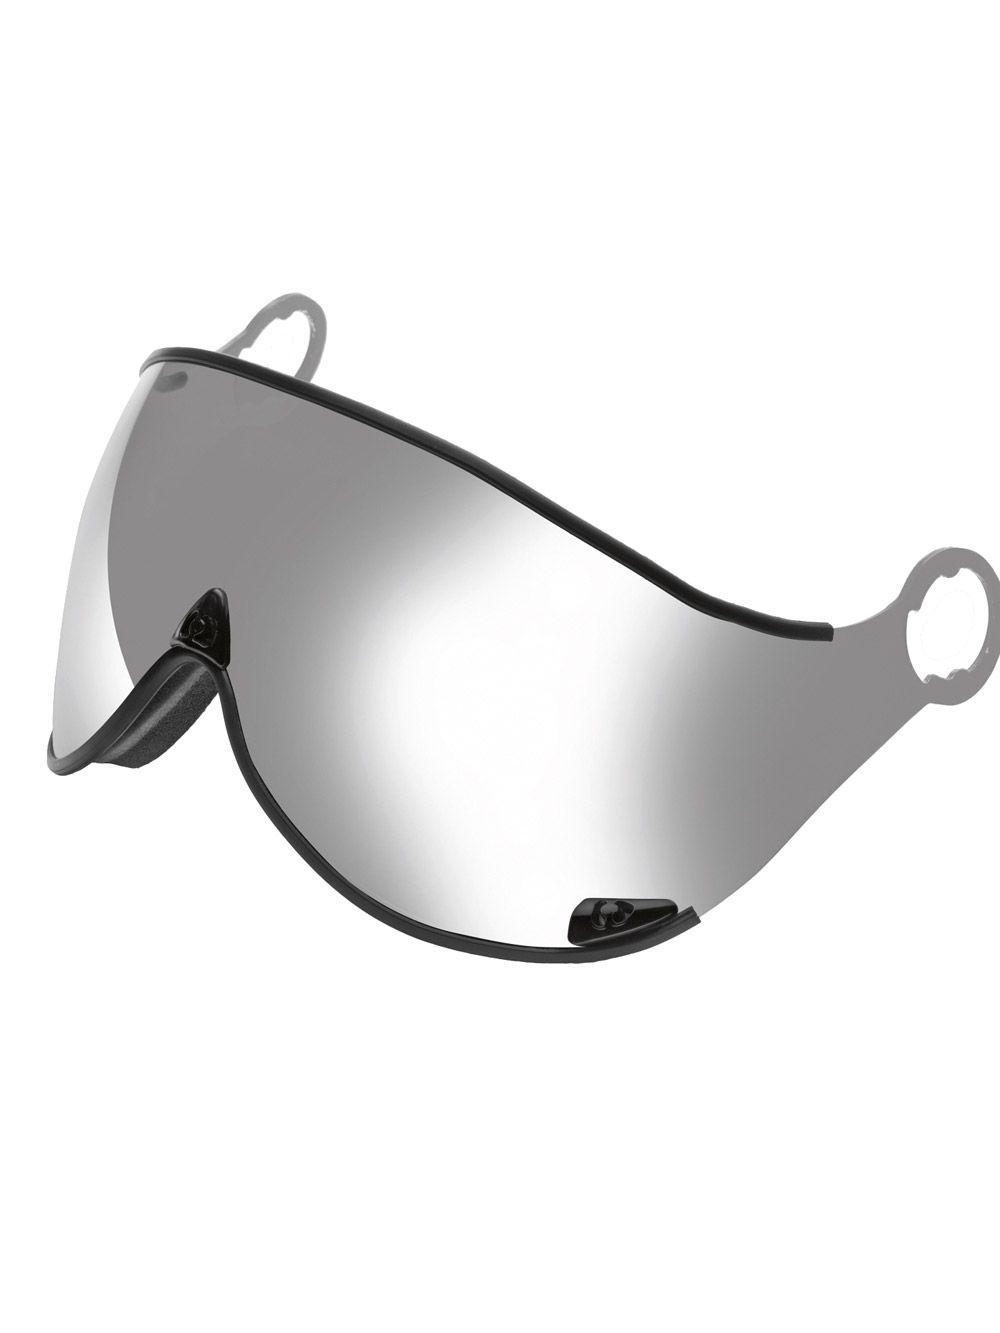 Cp replacement ski helmet visors grey silver mirror ski for Mirror visor